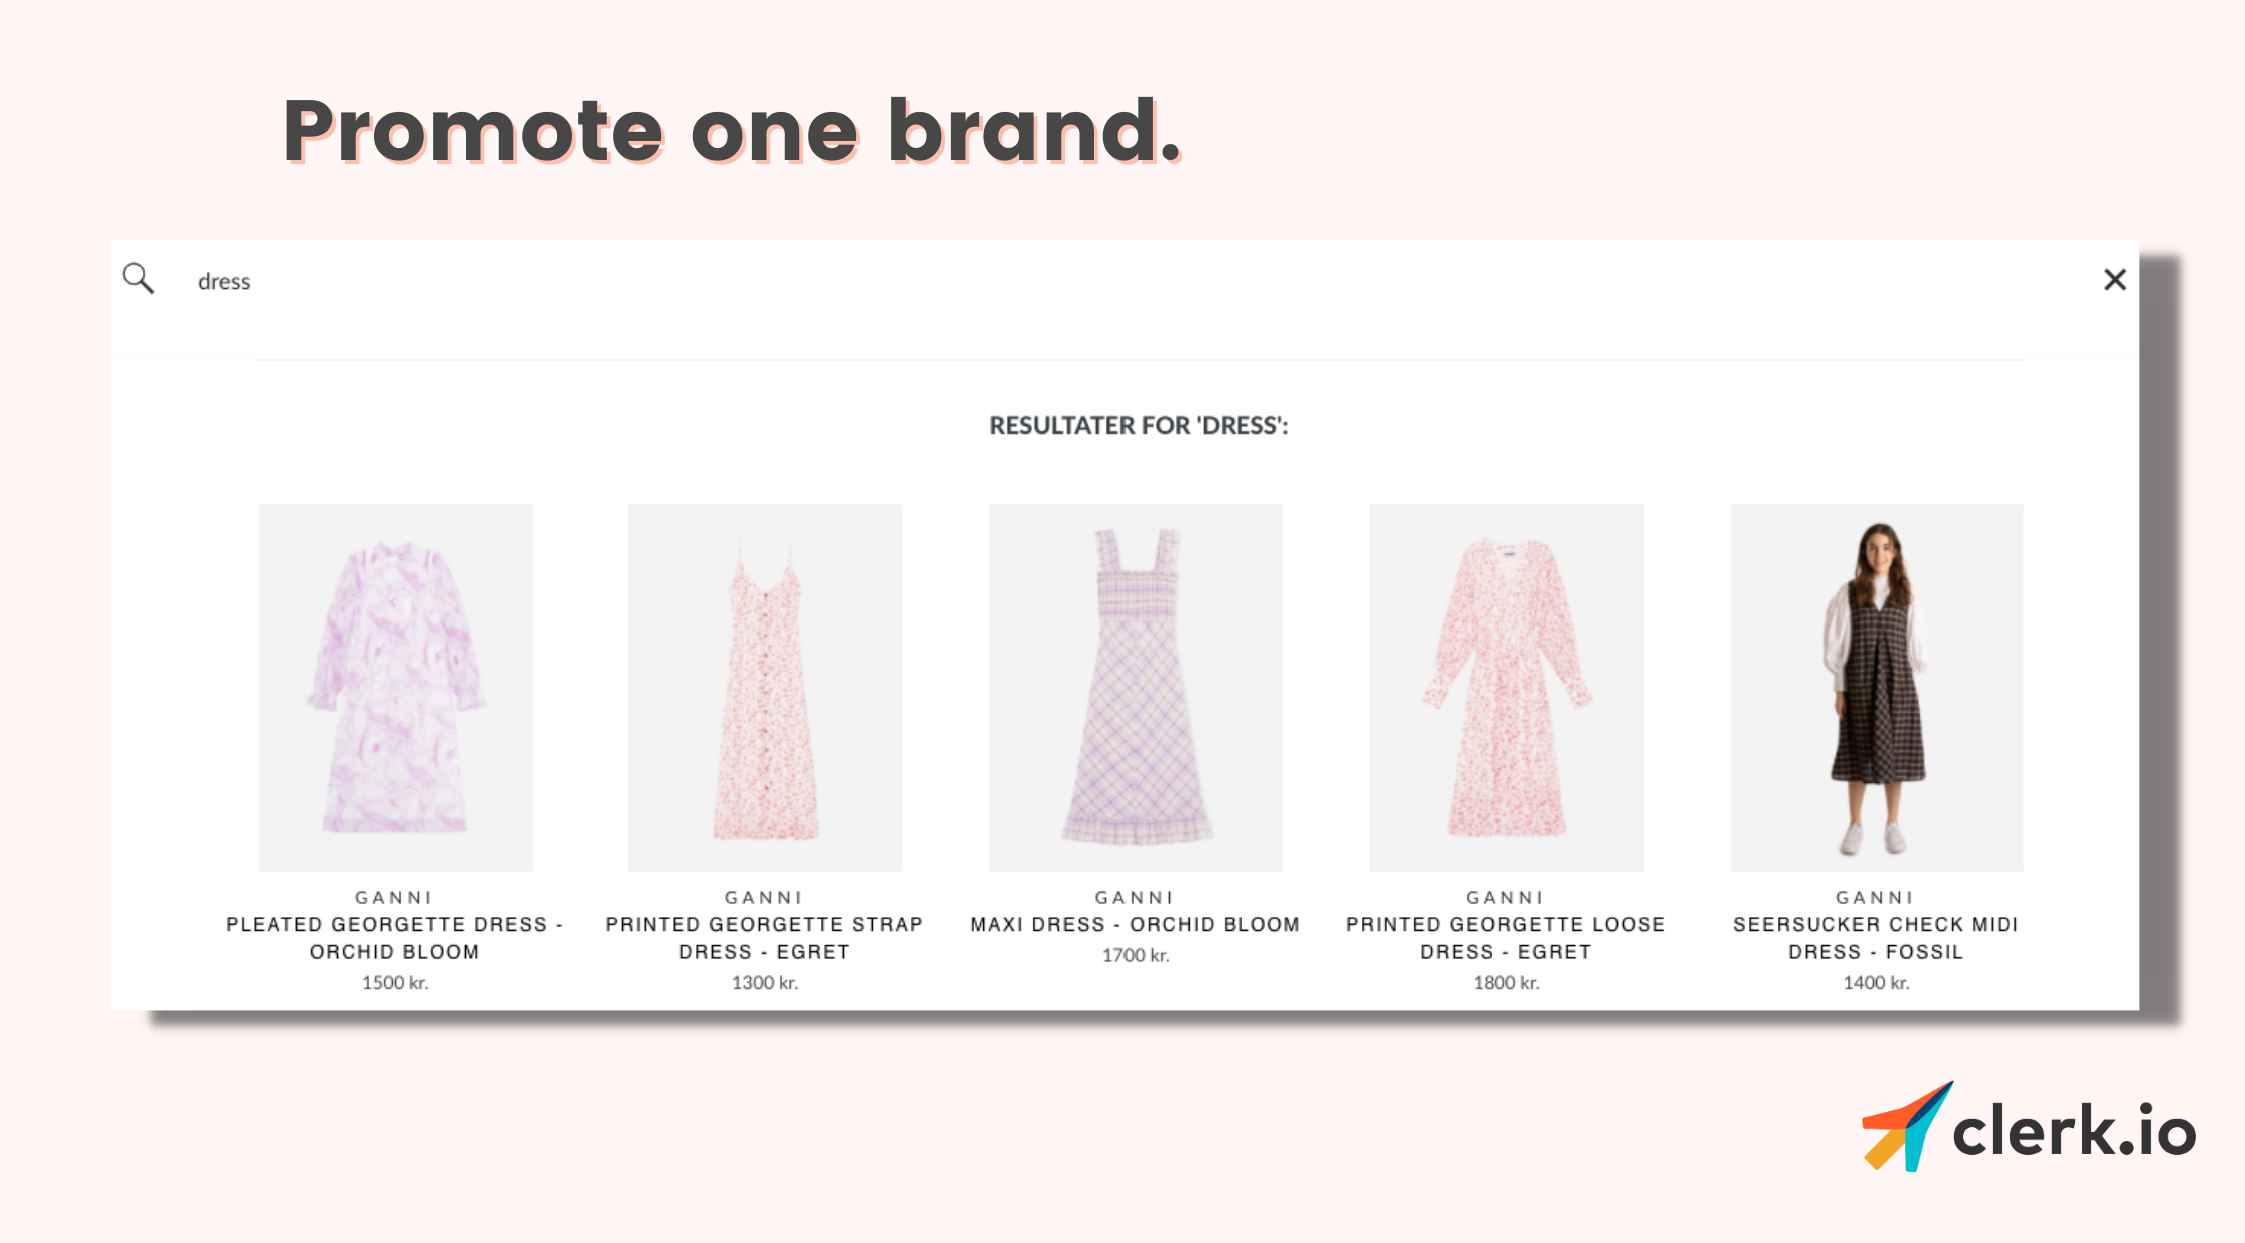 merchandising: promote one brand